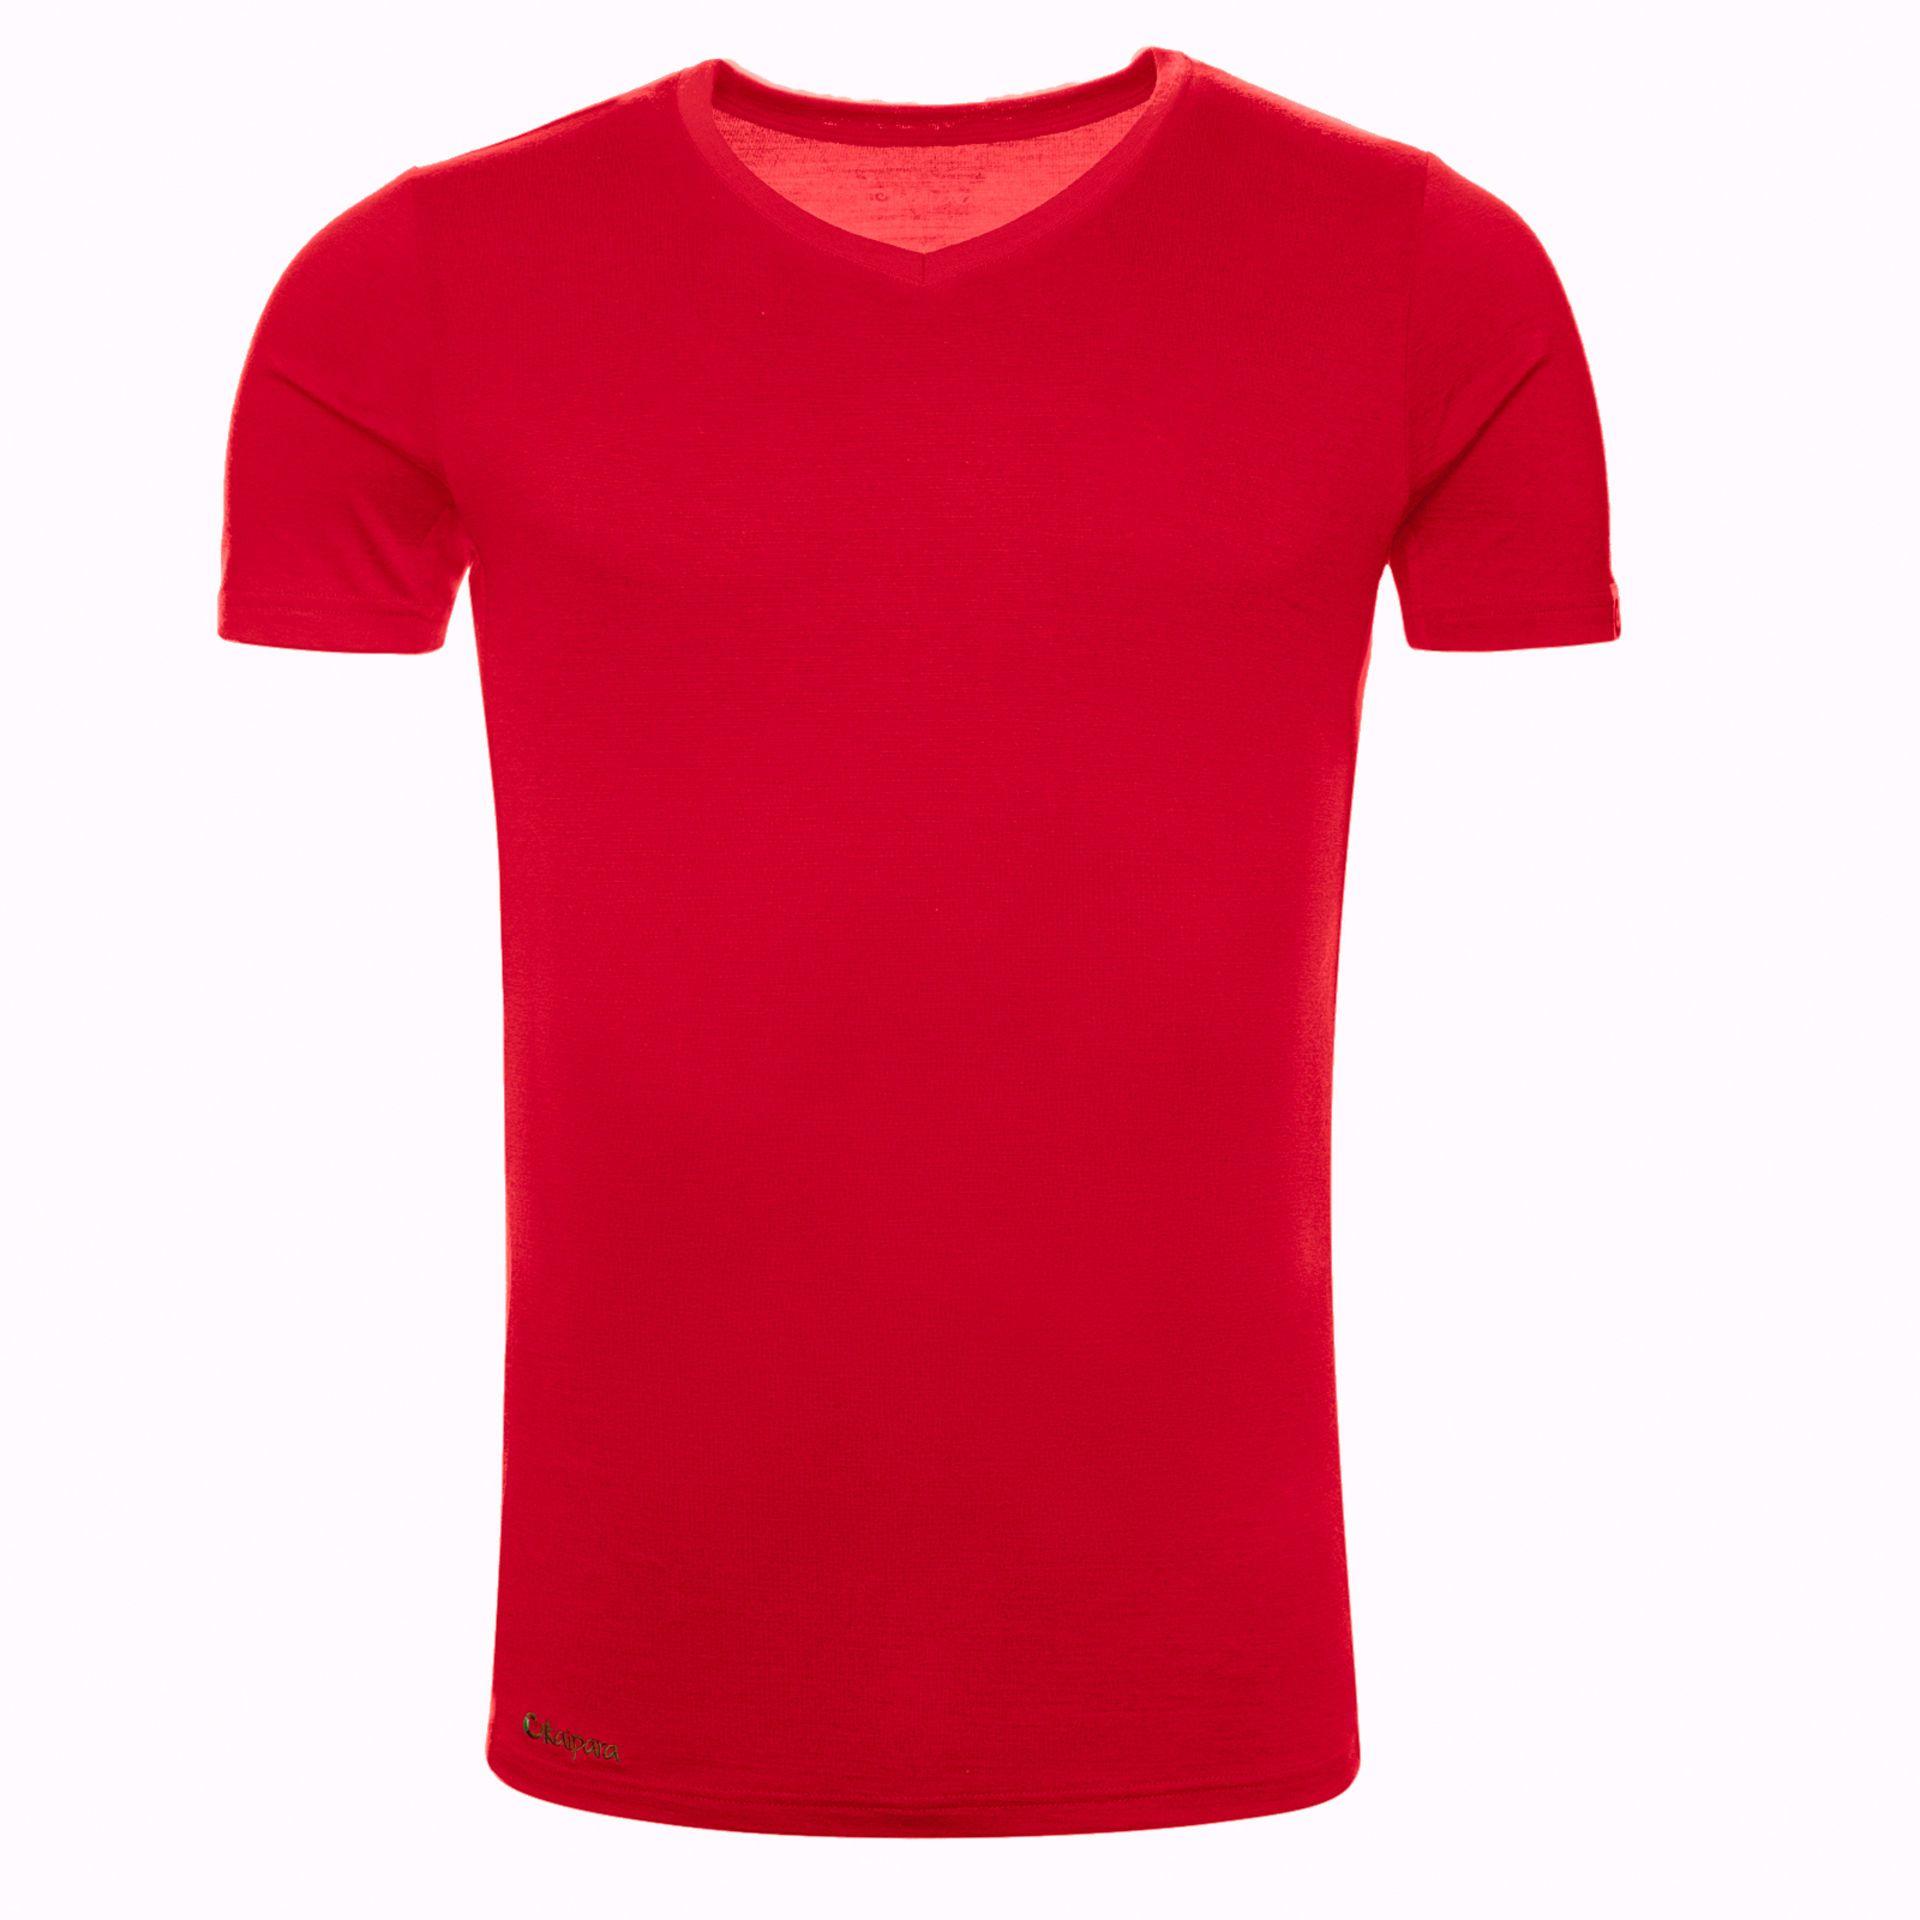 Merino Shirt Herren Kurzarm Slimfit V-Neck 200 Cherry Red / L